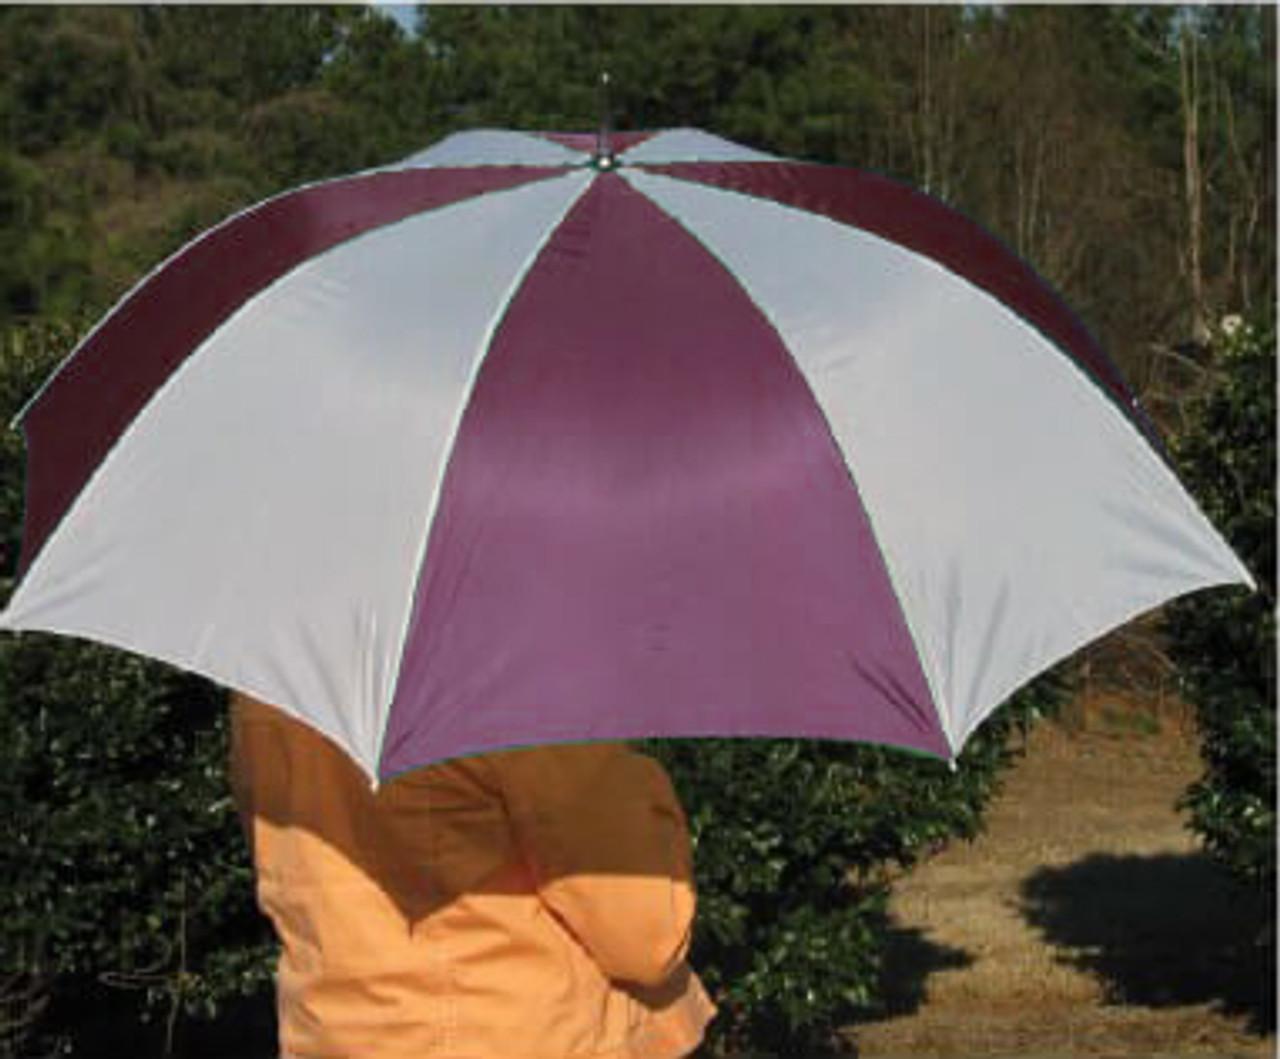 Burgundy Golf Umbrellas -Keep prospects dry